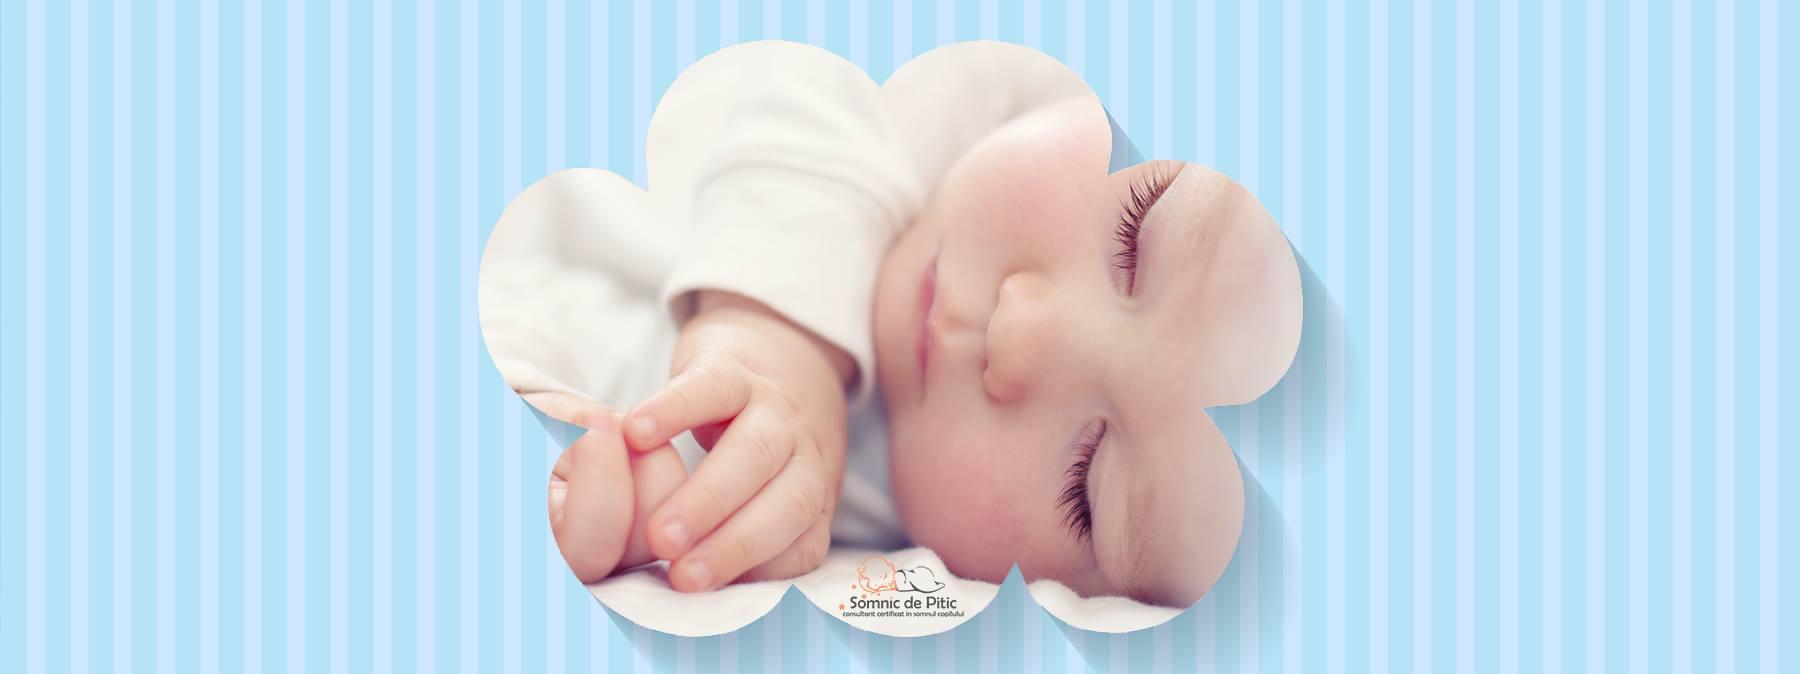 detaliu cu fata unui bebelus care doarme